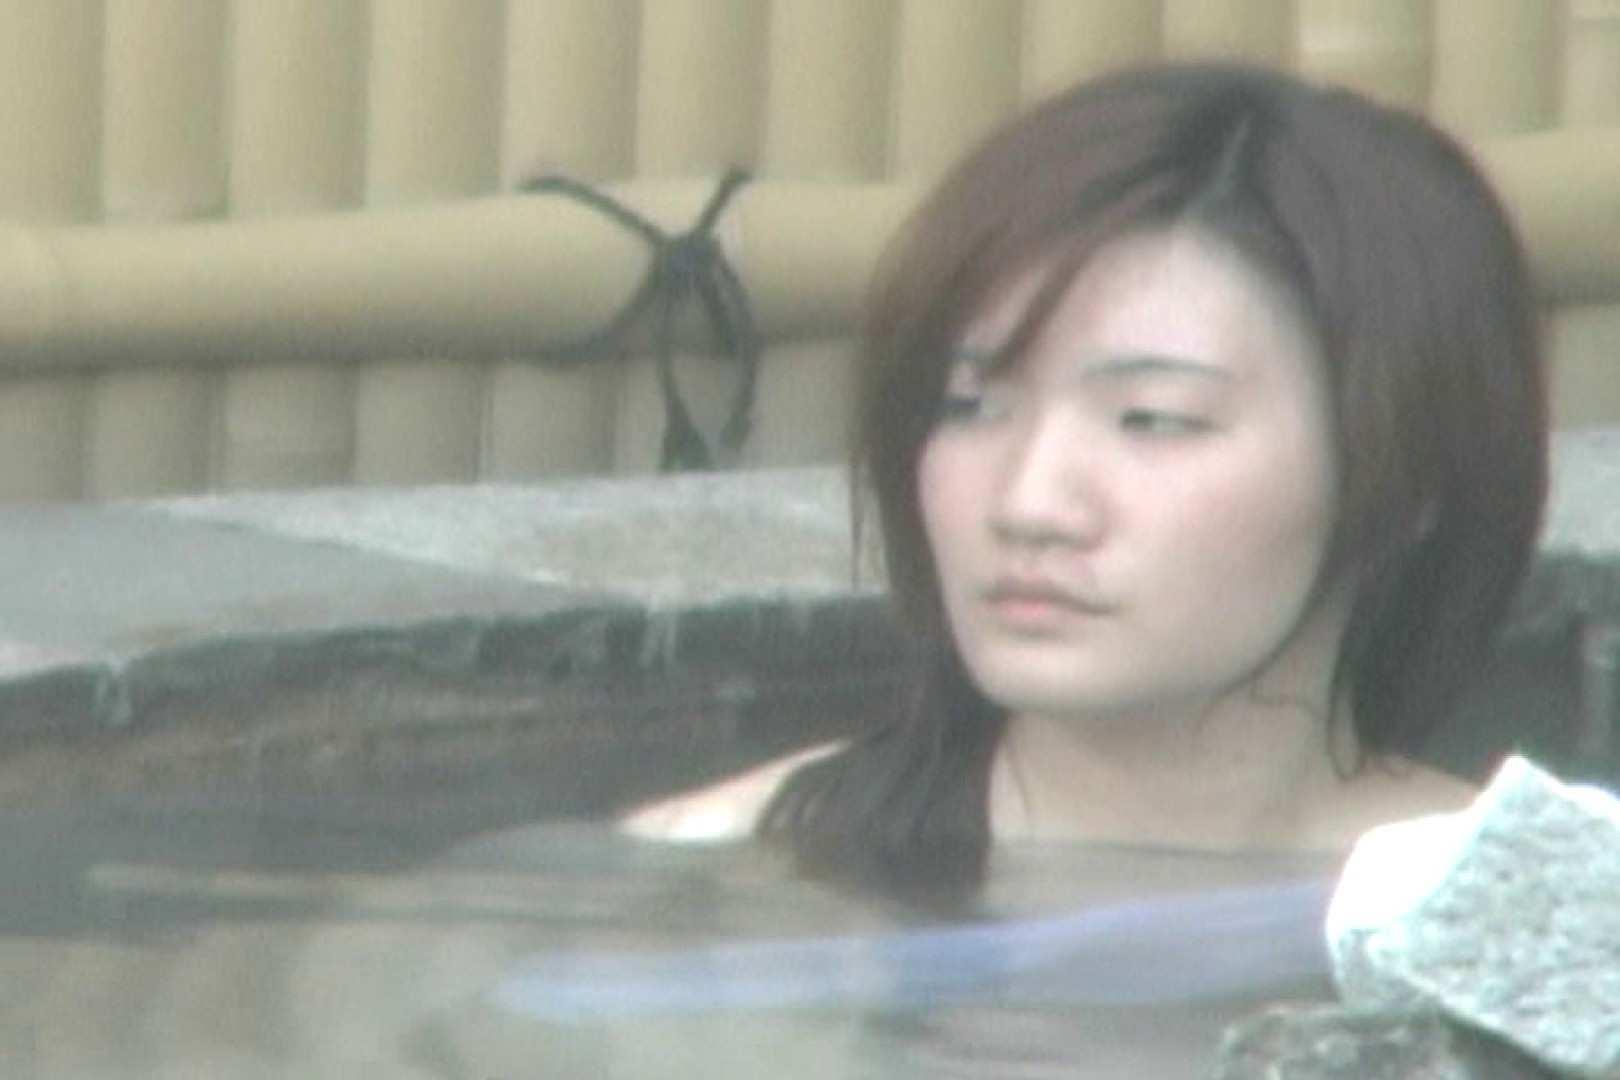 Aquaな露天風呂Vol.590 HなOL 濡れ場動画紹介 112pic 67